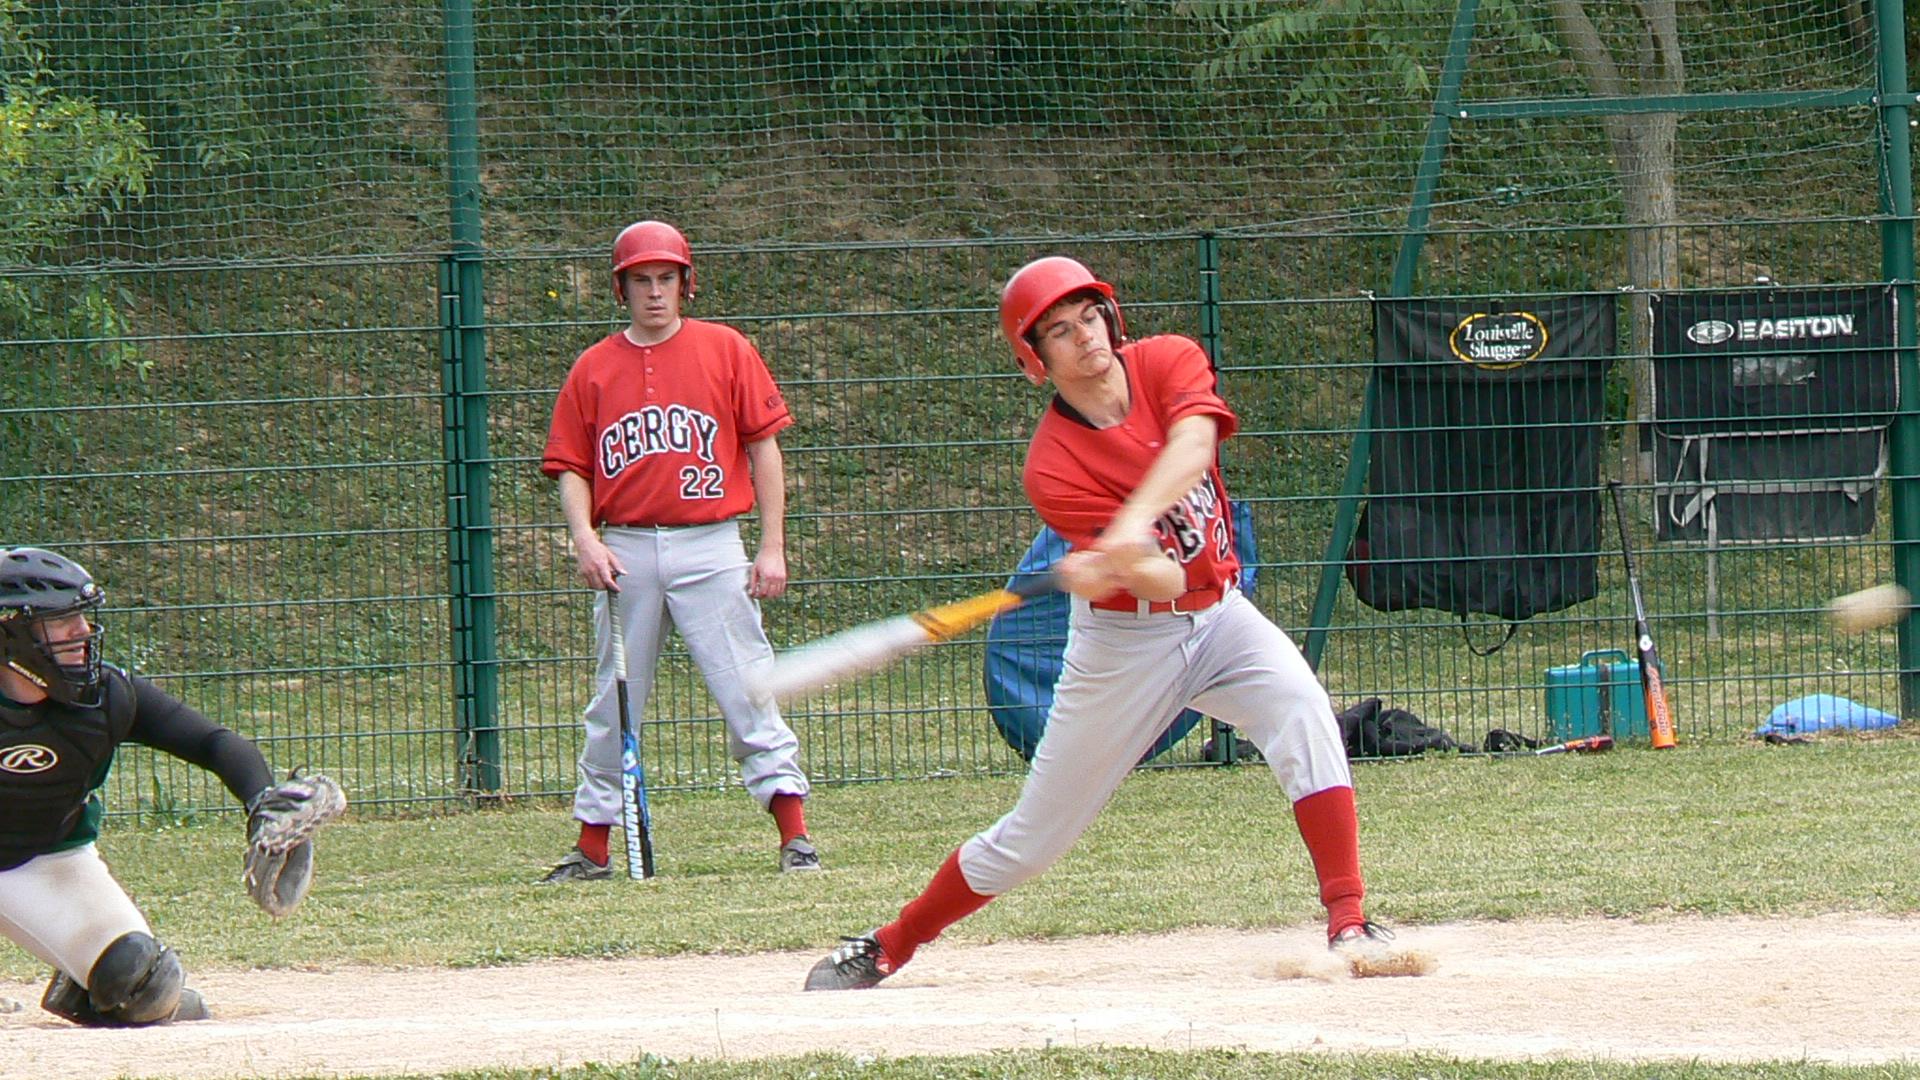 2011-05-08 vs Montigny (21)